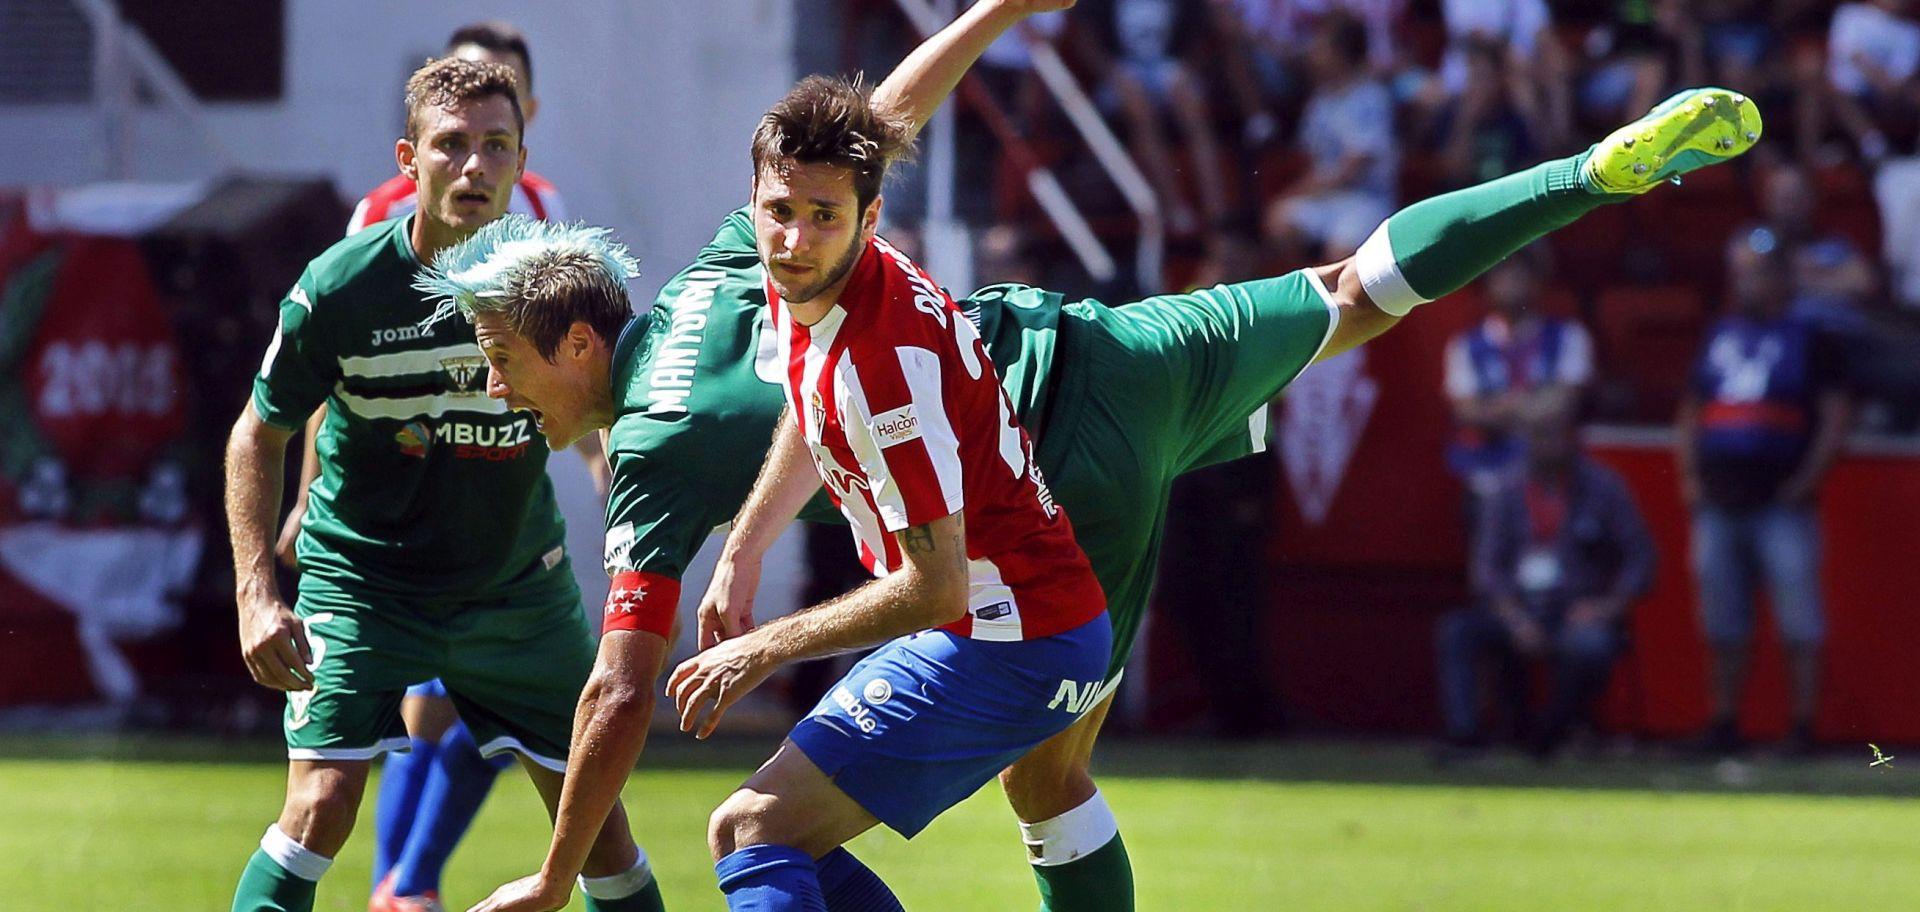 PRIMERA Pogodak Čopa u porazu Gijona, Real remizirao s Villarealom